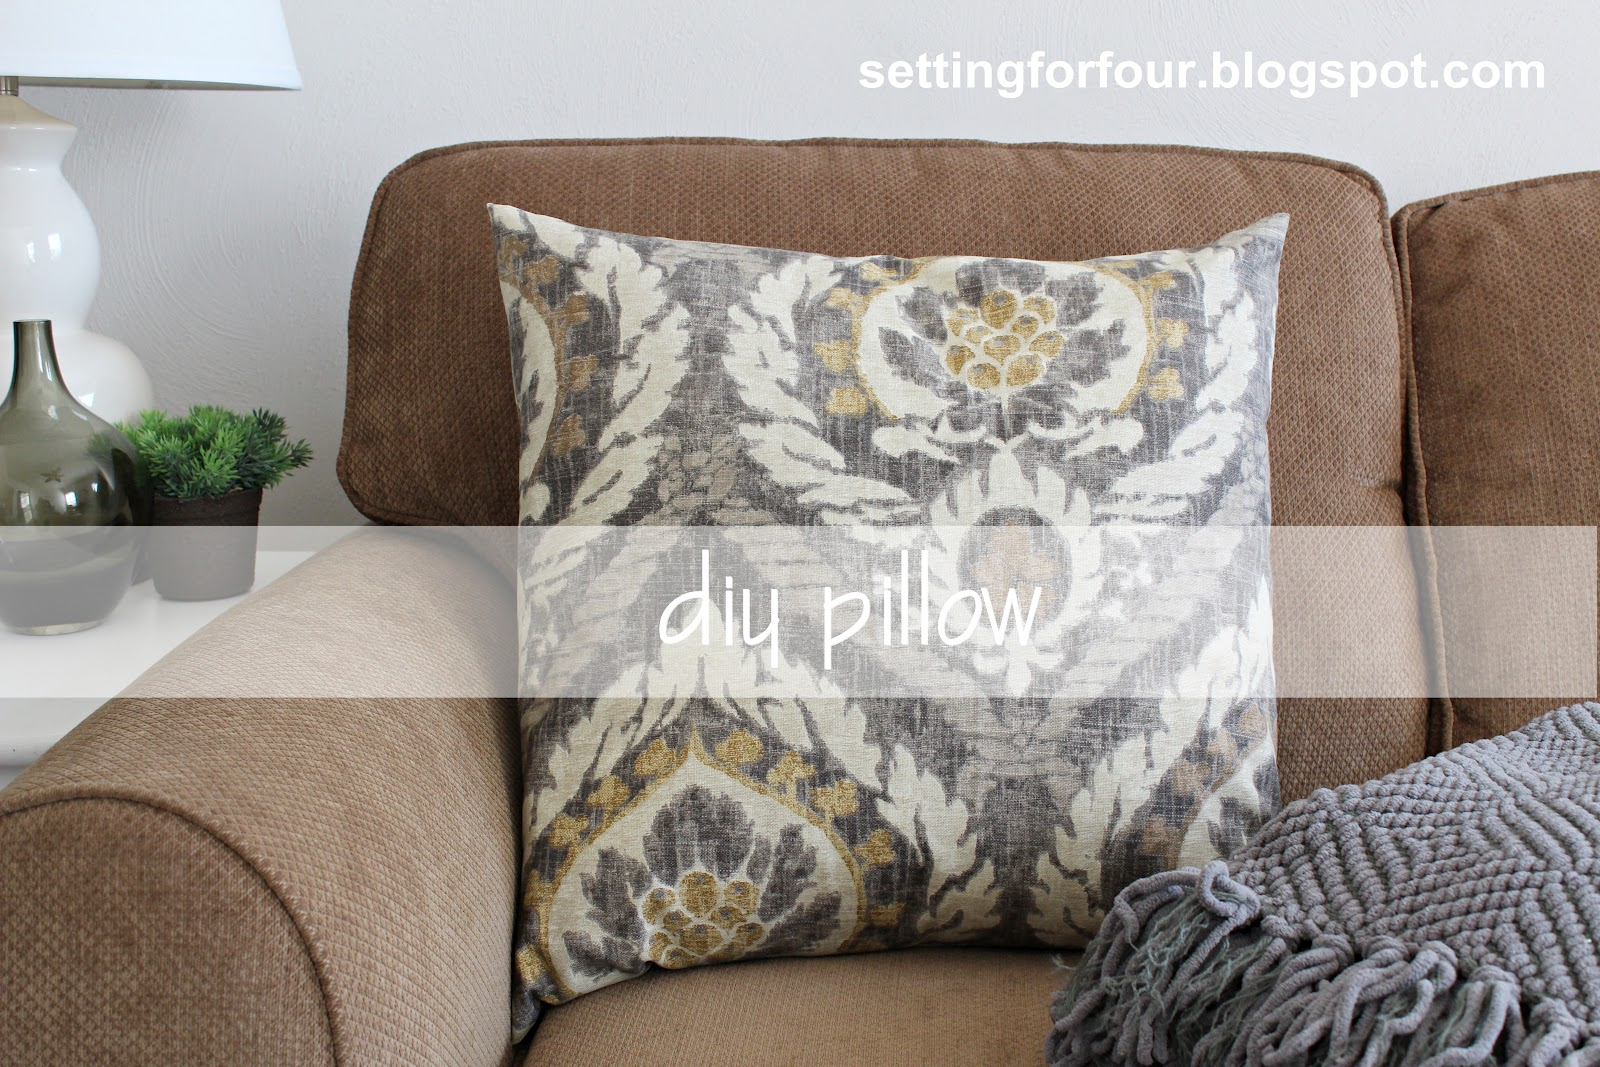 DIY Pillow Cover 5 Minutes to Make! & DIY Pillow Cover 5 Minutes to Make! - Setting for Four pillowsntoast.com